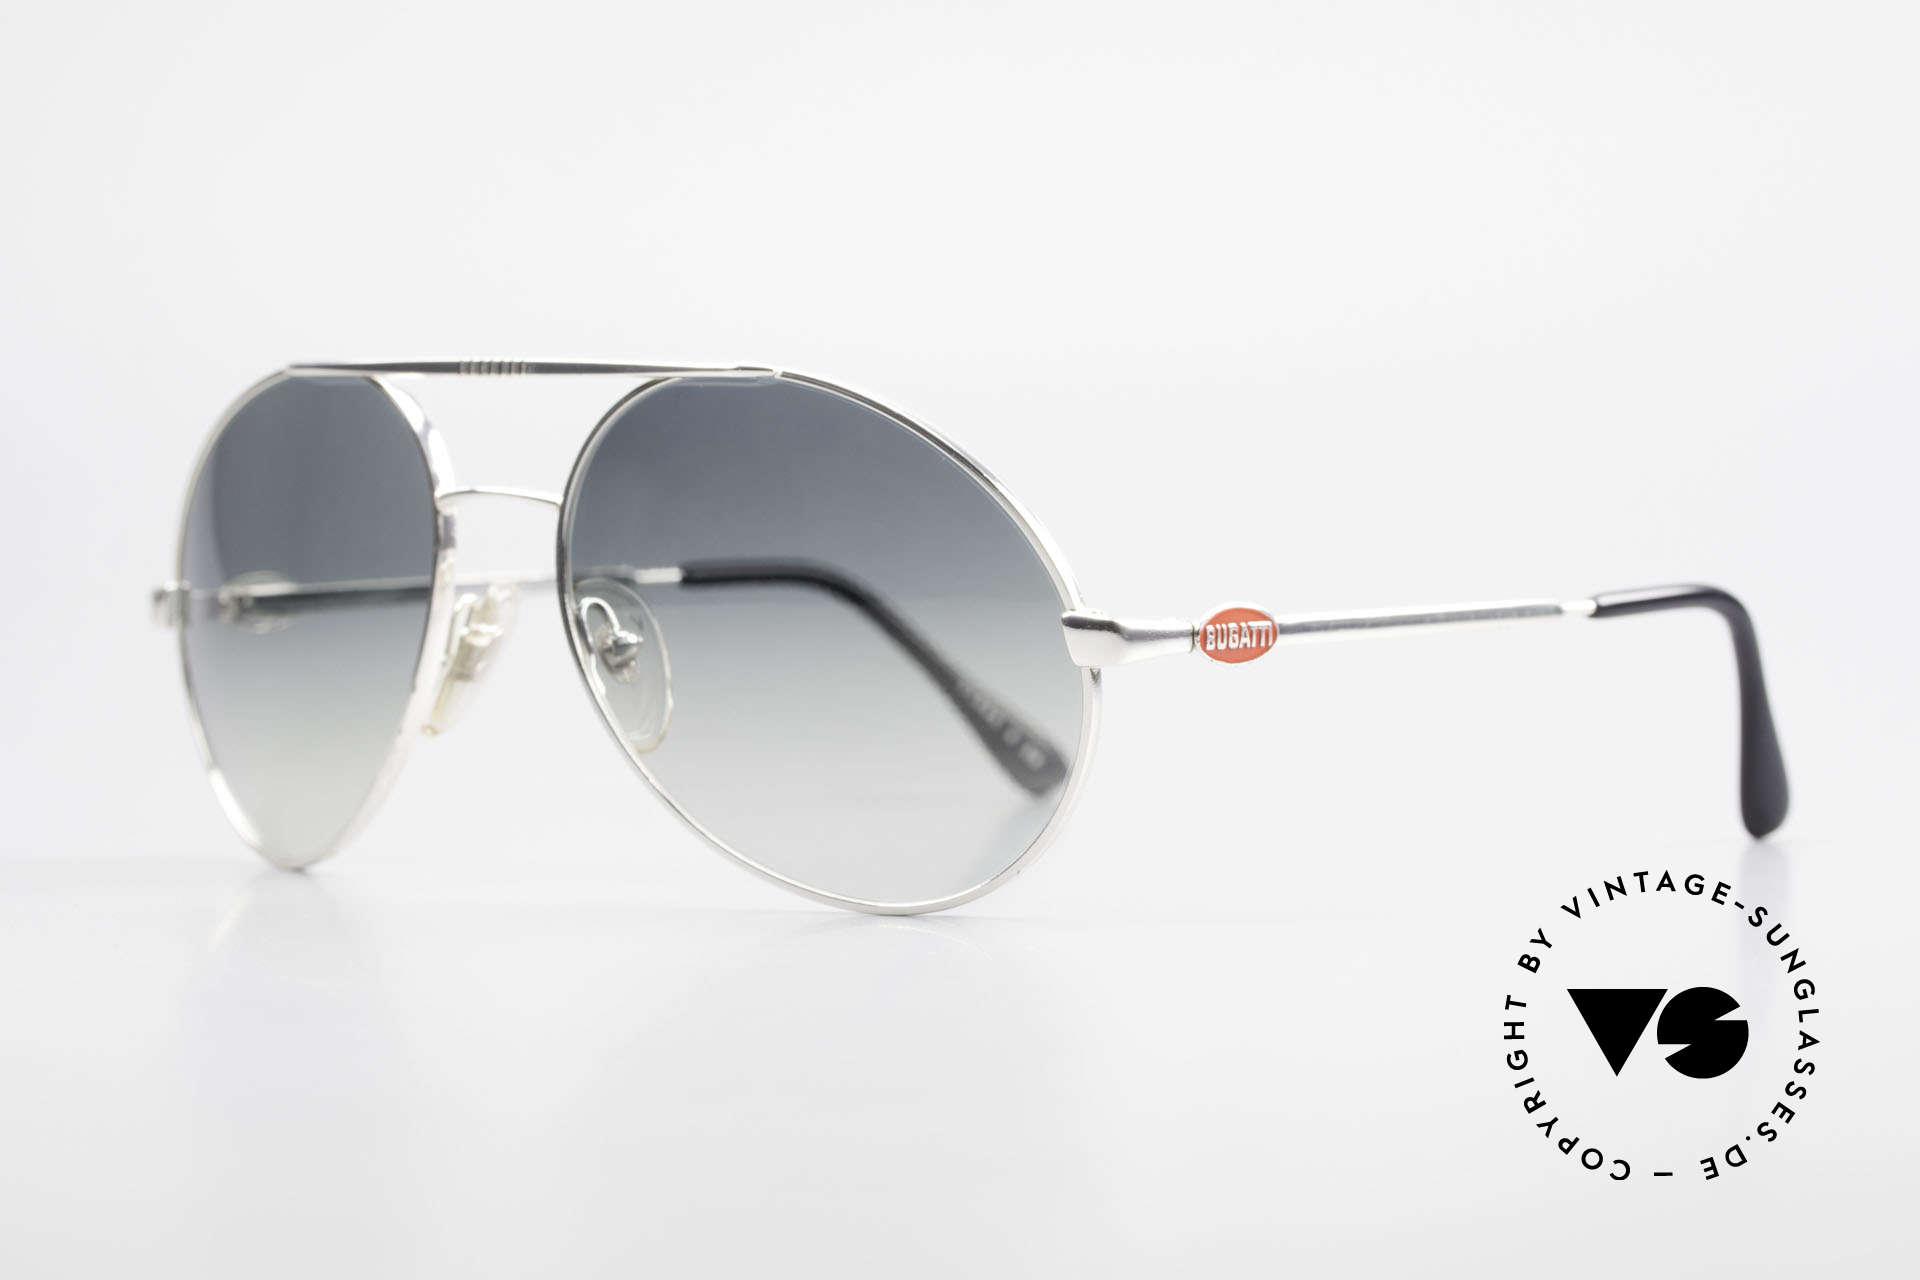 Bugatti 65996 Costly Mirrored Sun Lenses, very noble sun lenses: half mirrored blue-gray, Made for Men